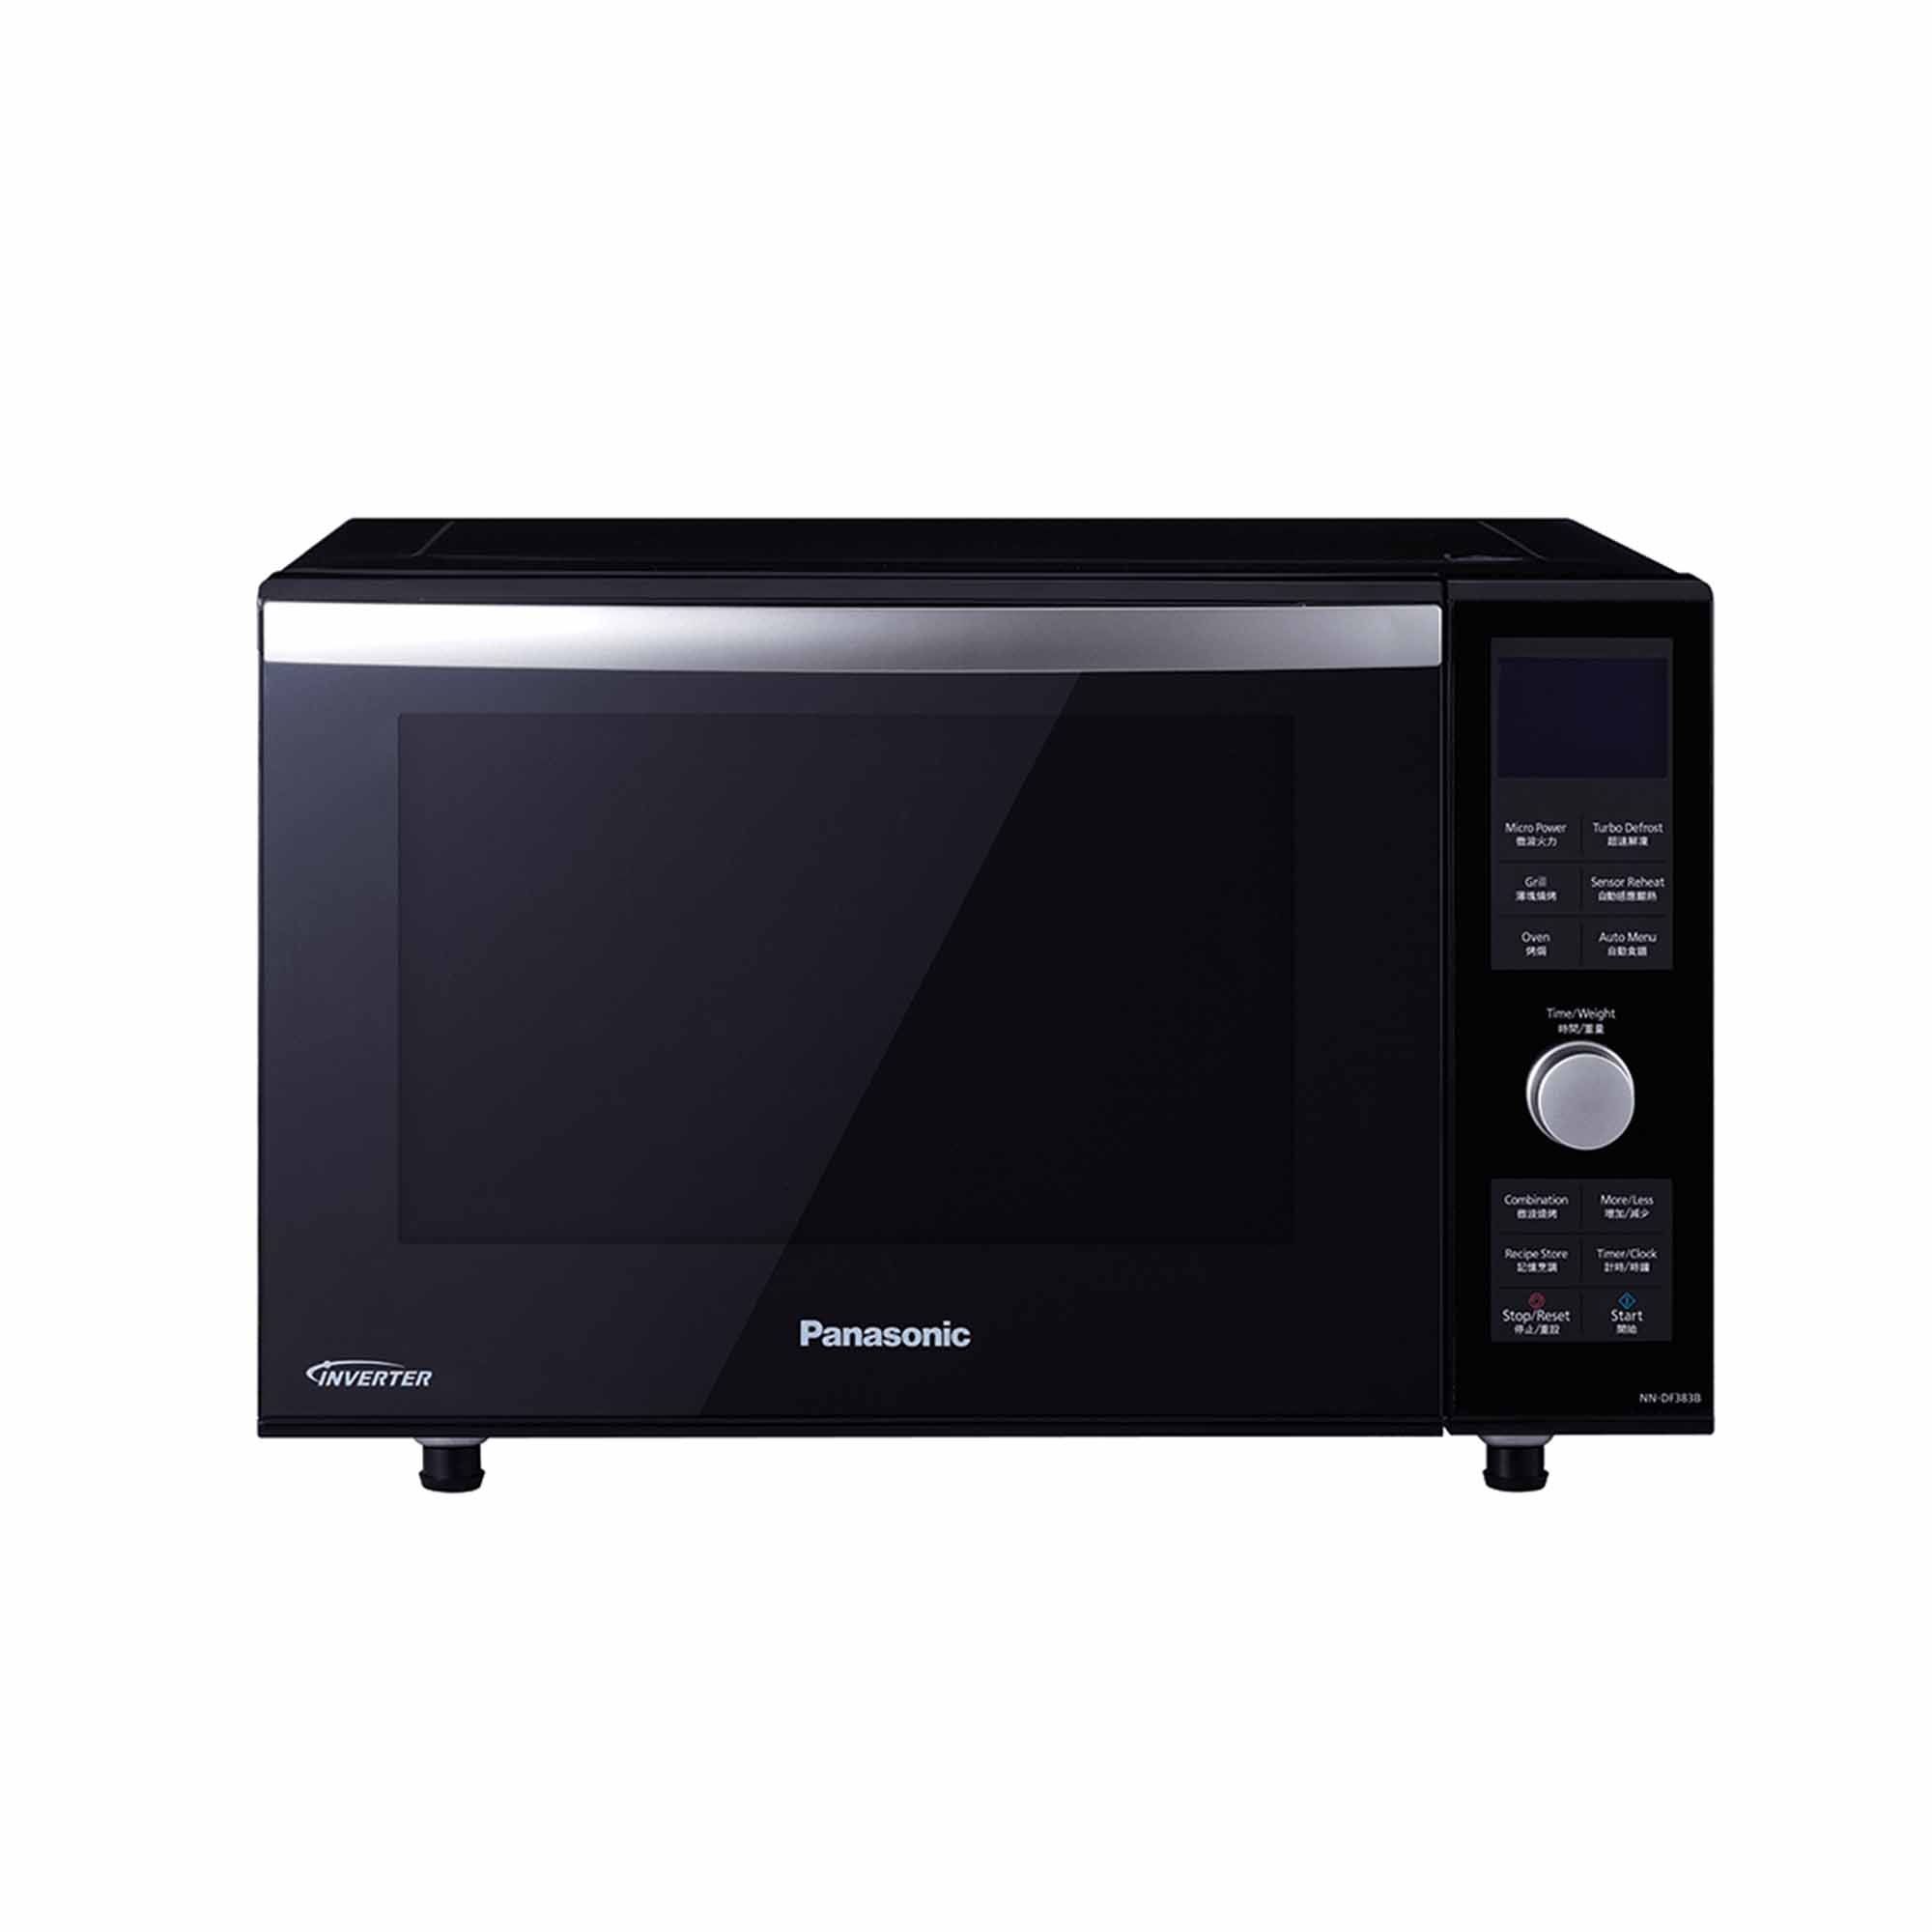 Microwave Specs Panasonic Bestmicrowave